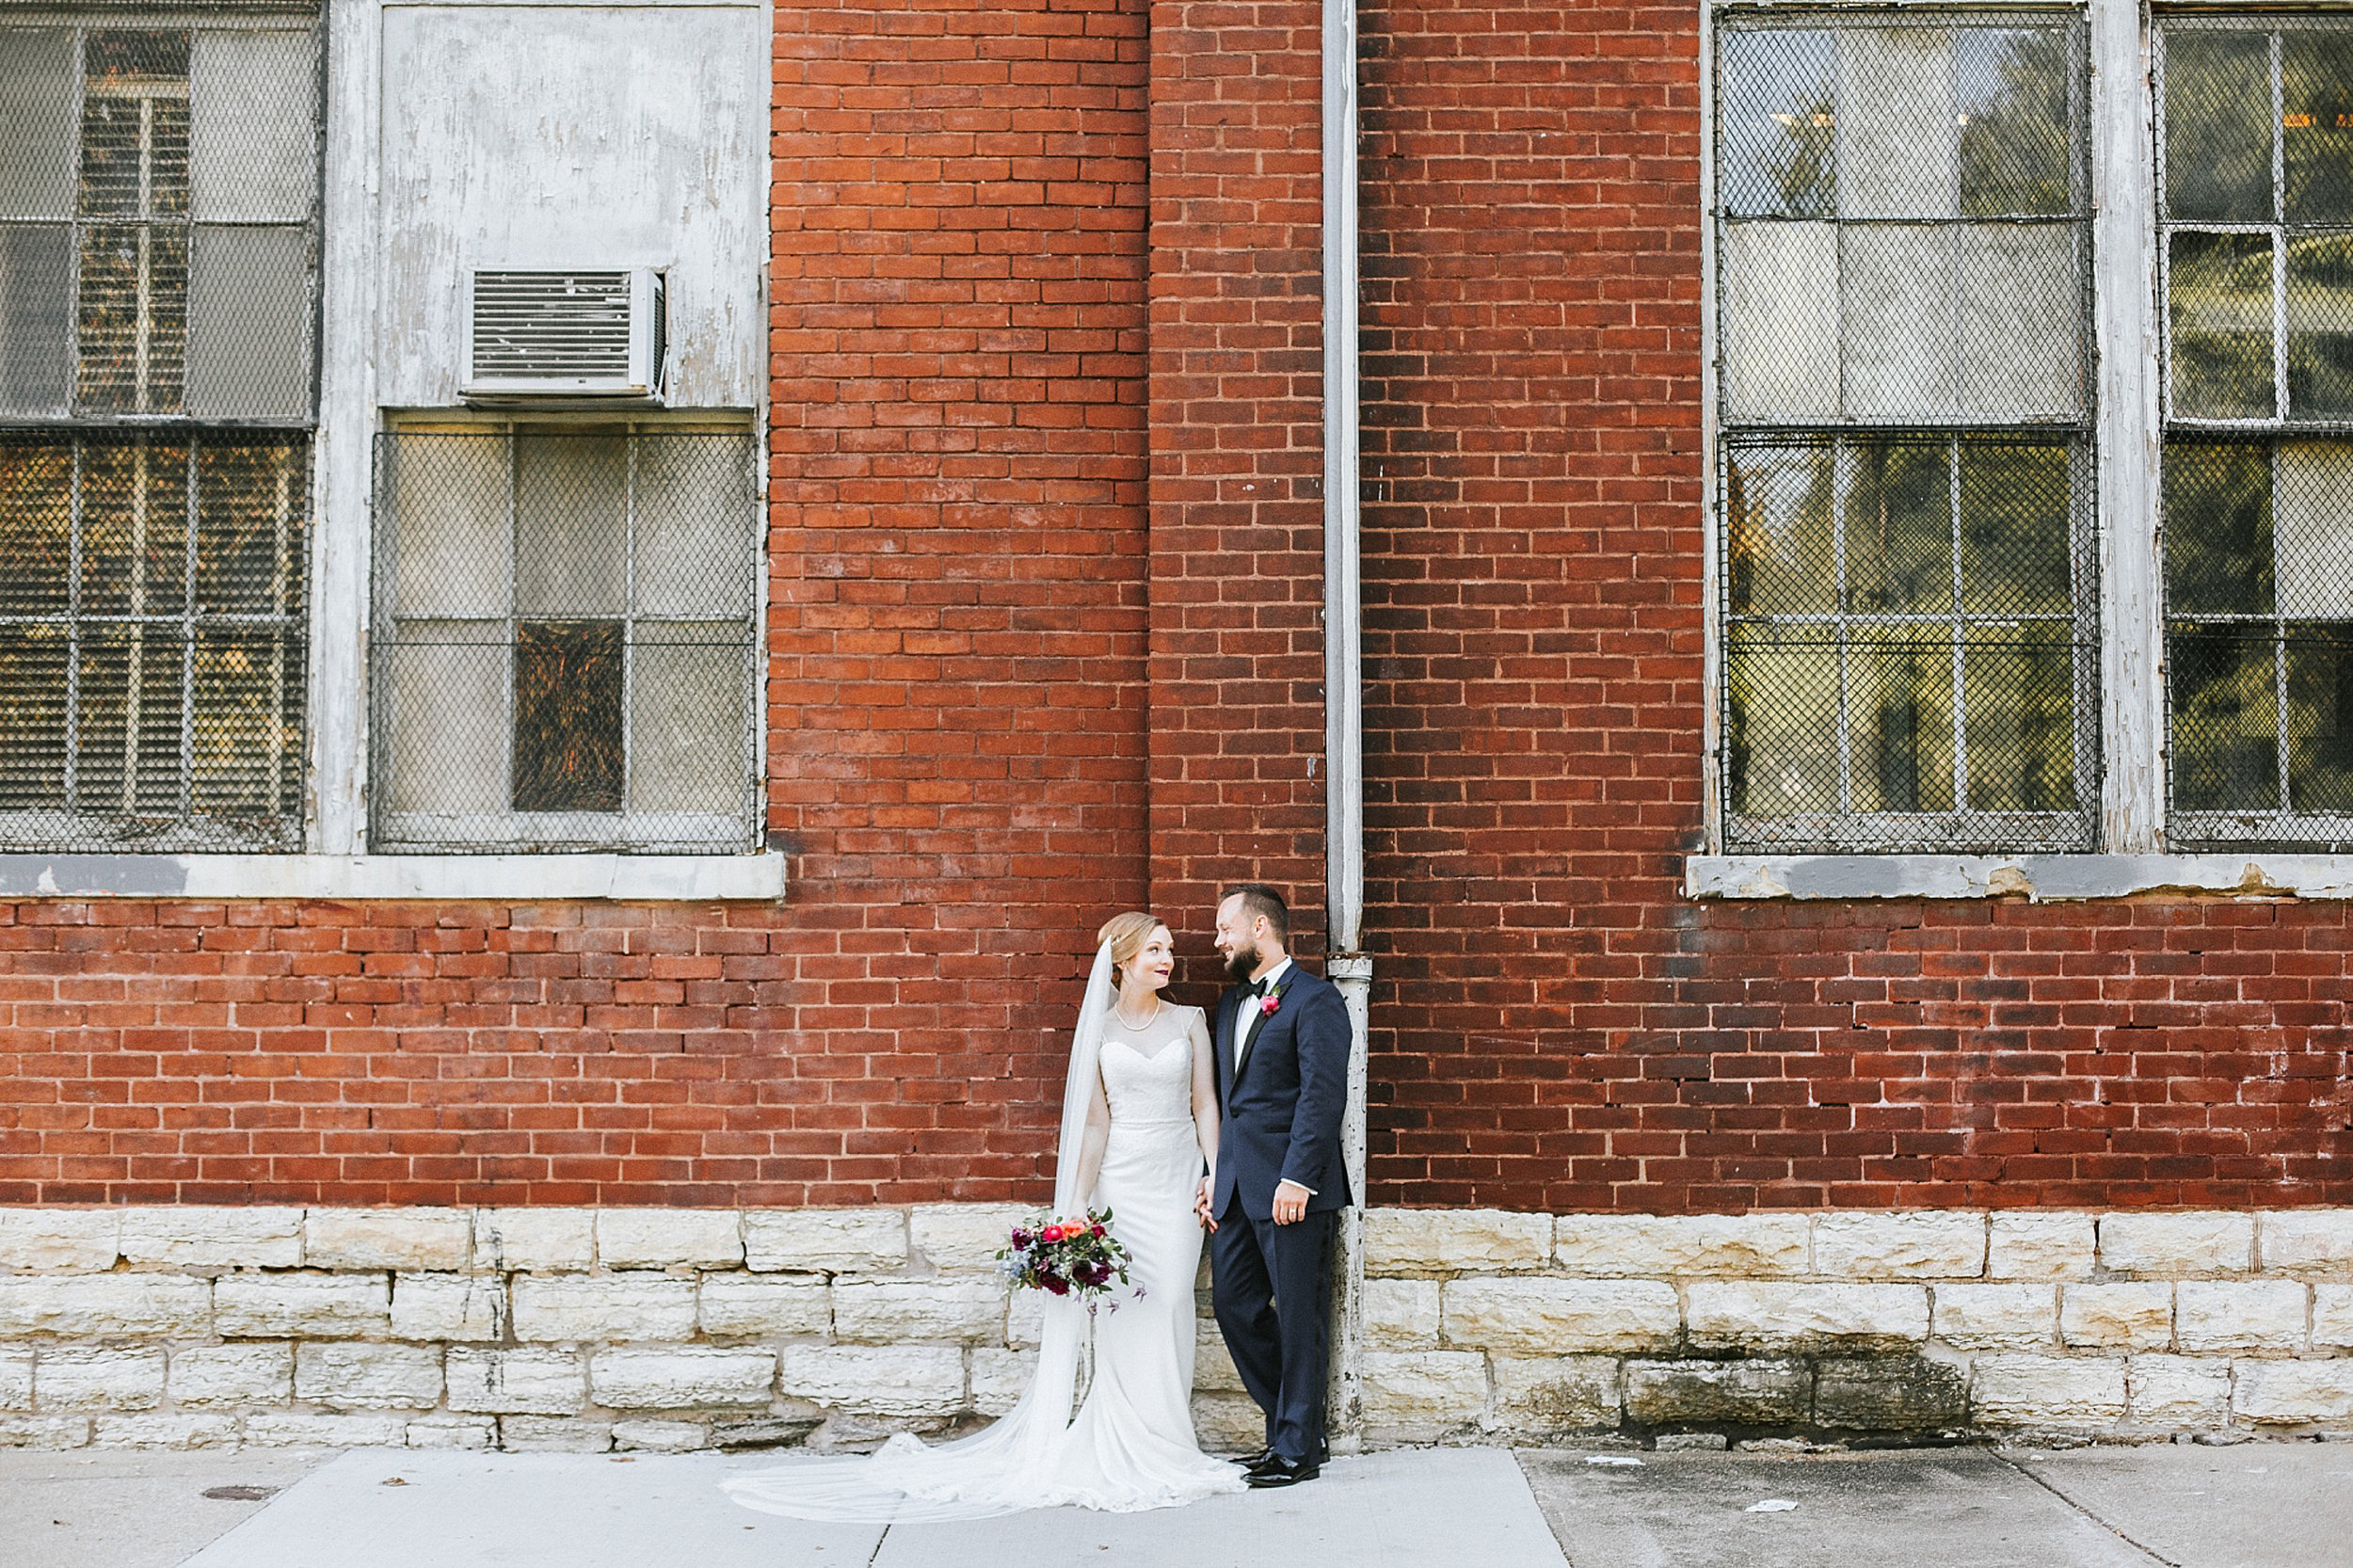 Brooke Townsend Photography - Ohio Wedding Photographer-158.jpg